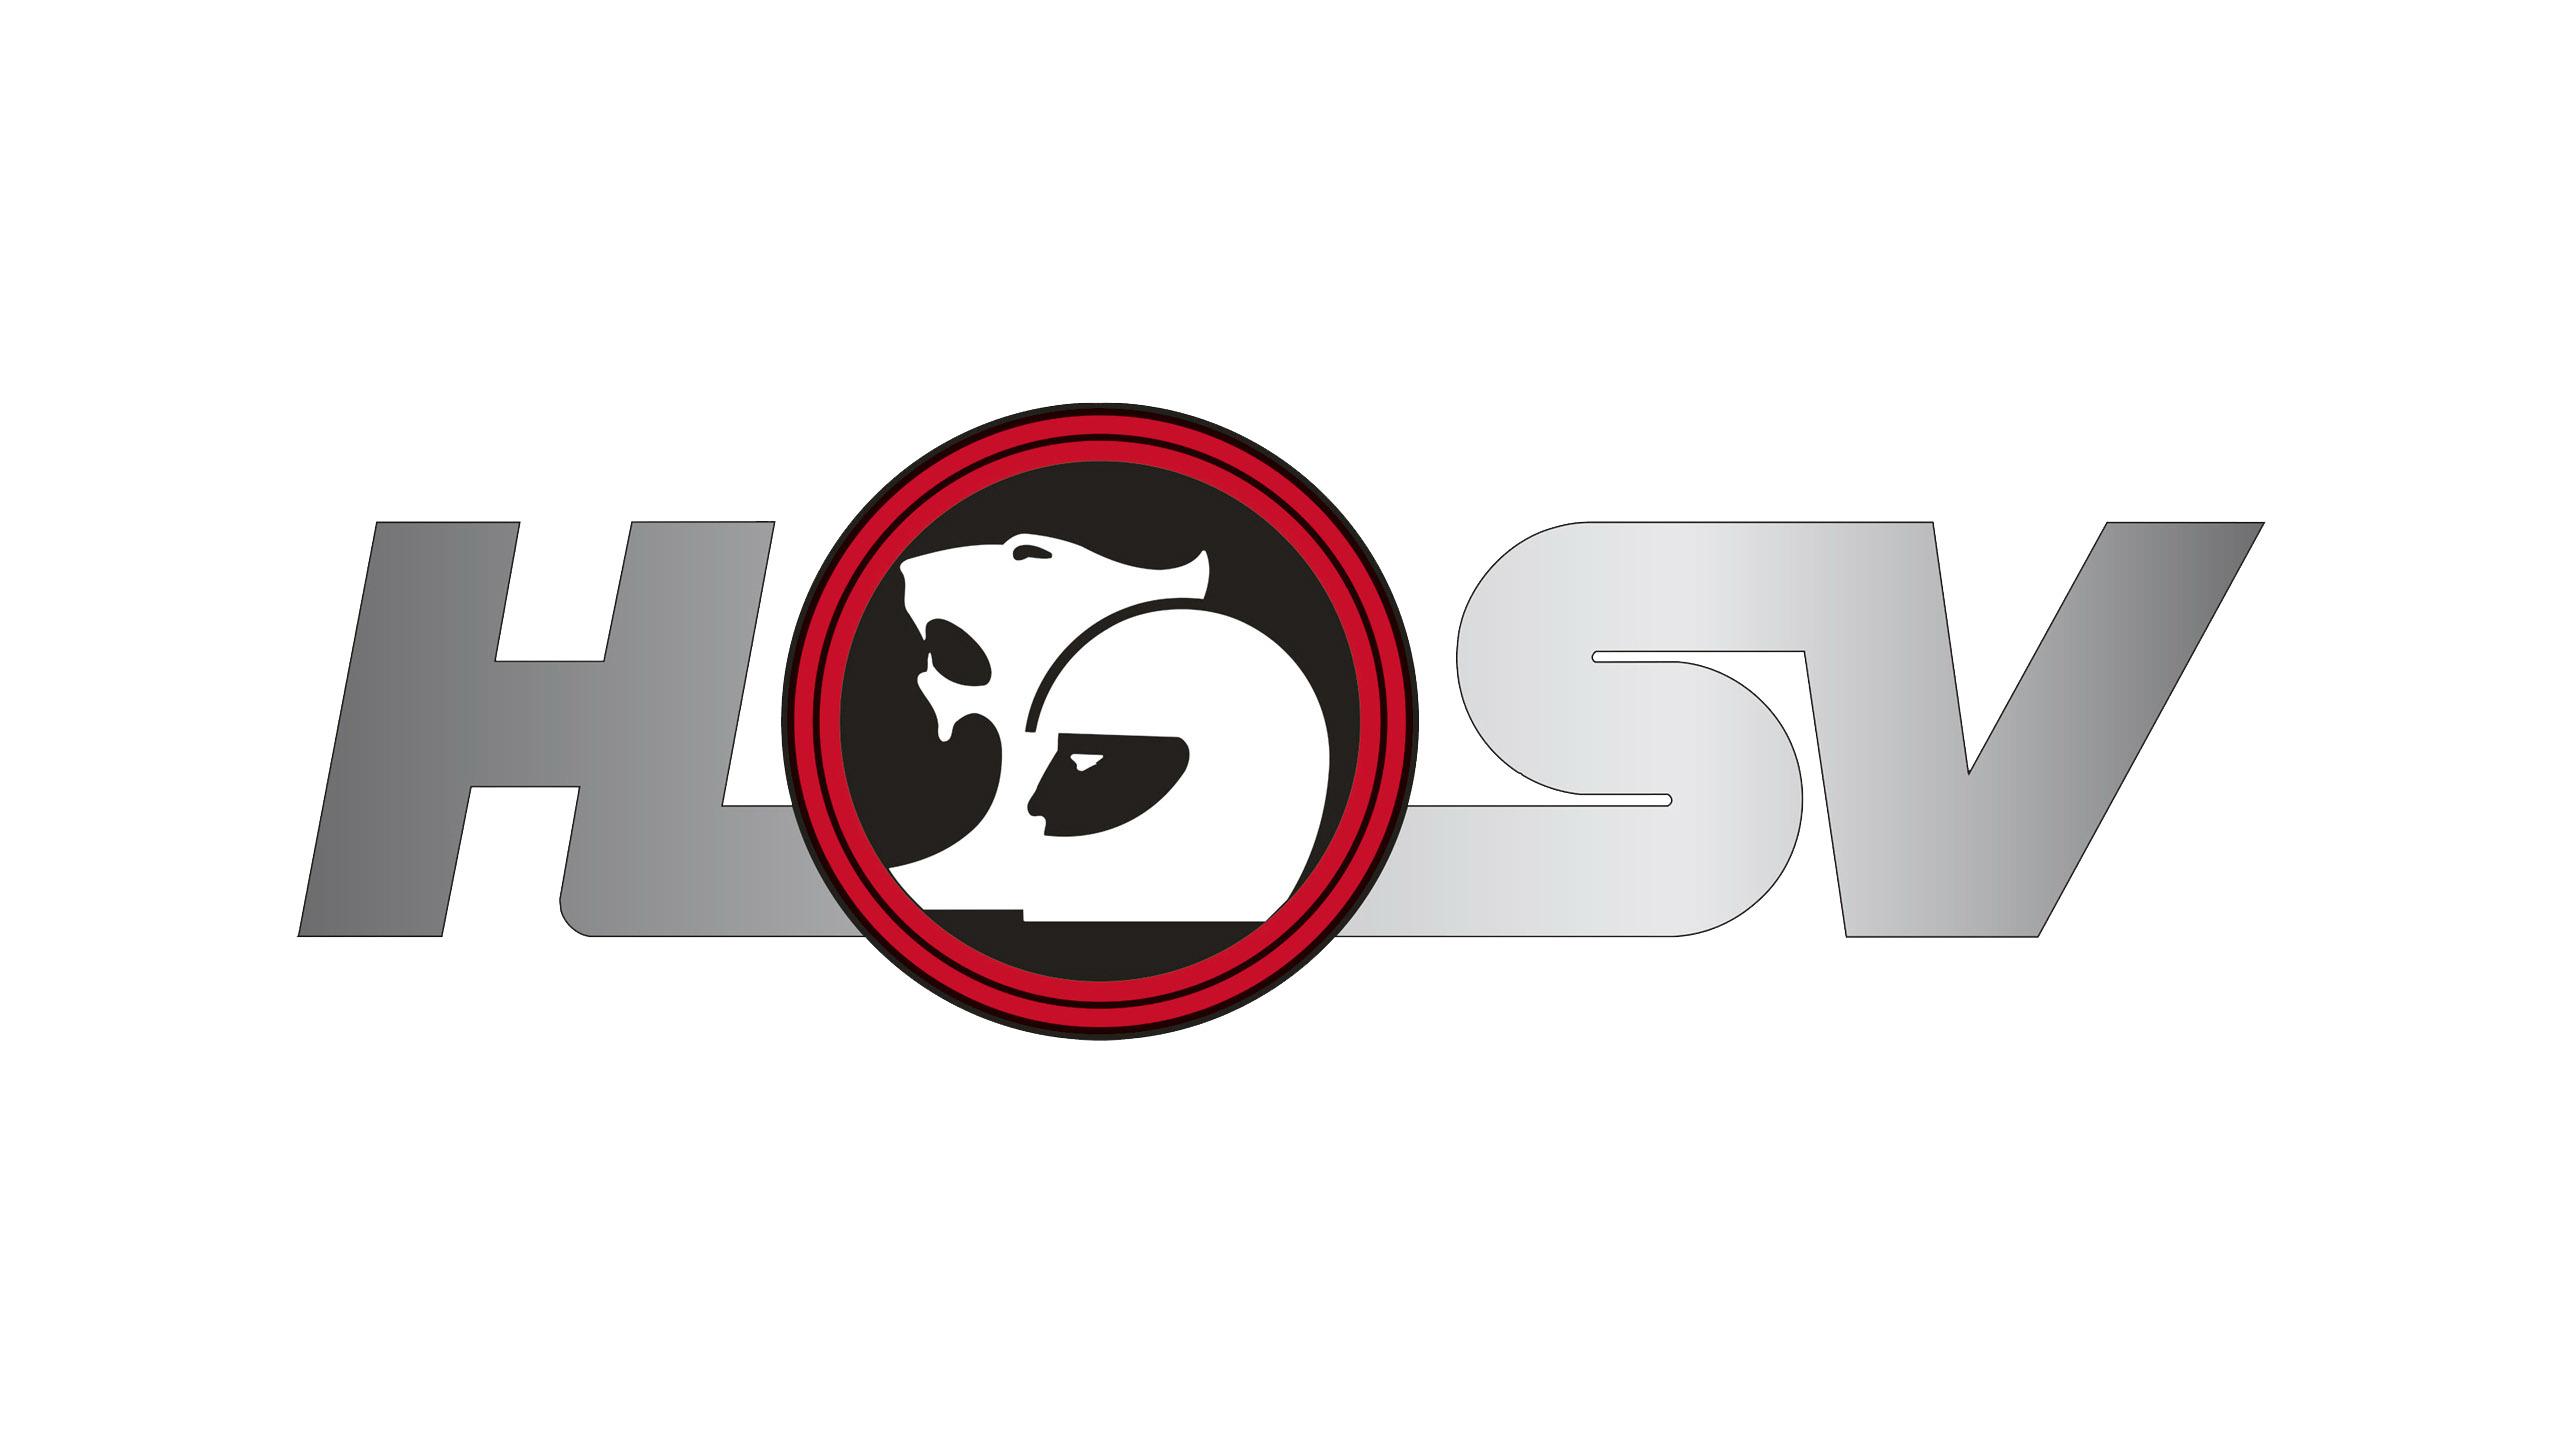 Imagen logo de HSV